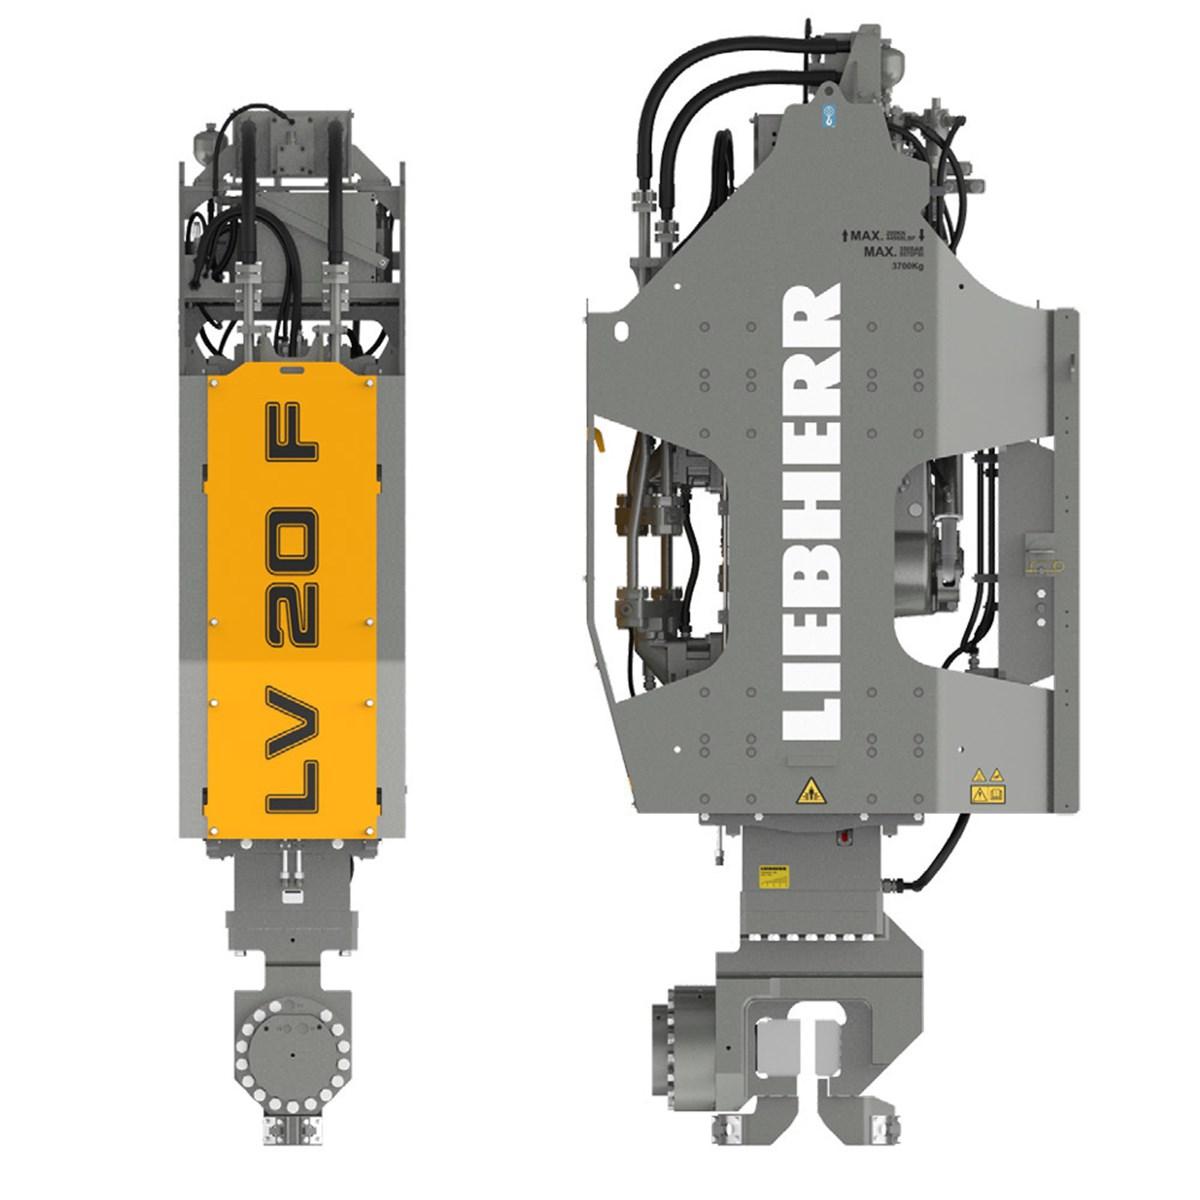 liebherr-lv-20-f-vibrator-dimensions.jpg